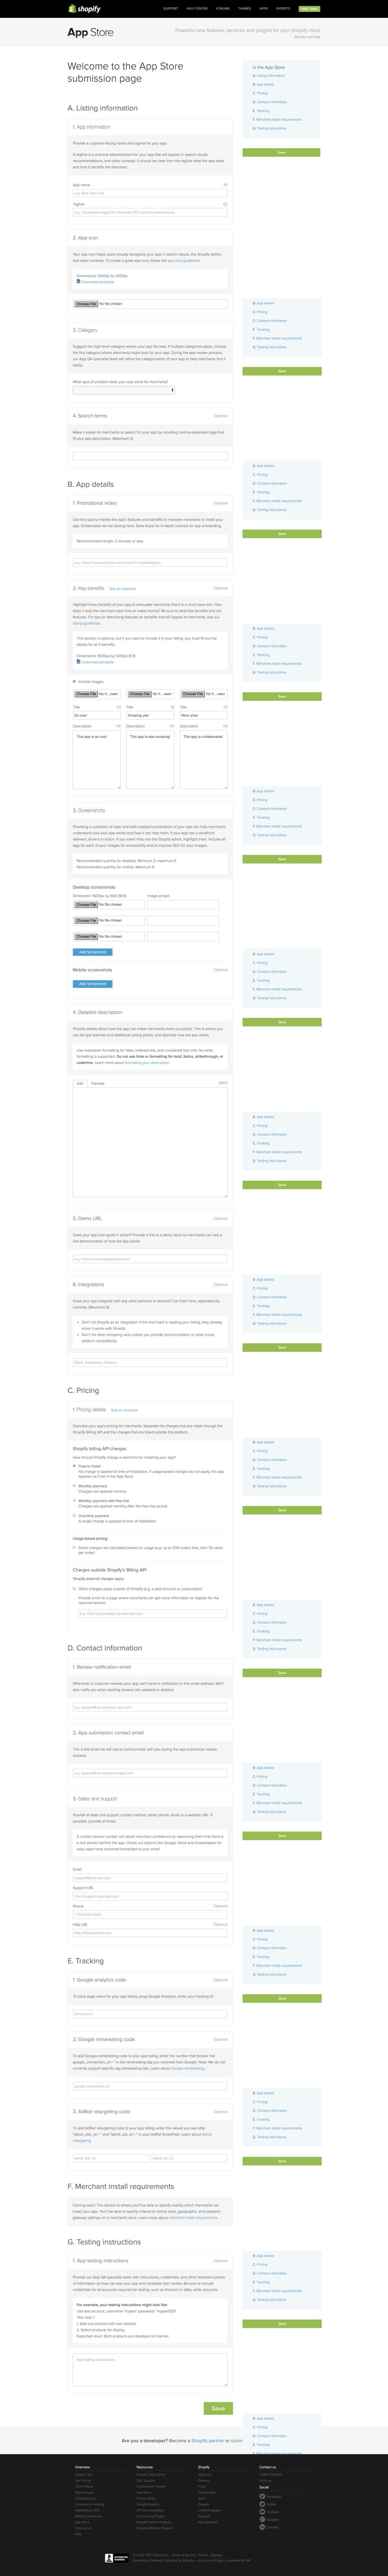 App Submission form v2 [Enhanced]